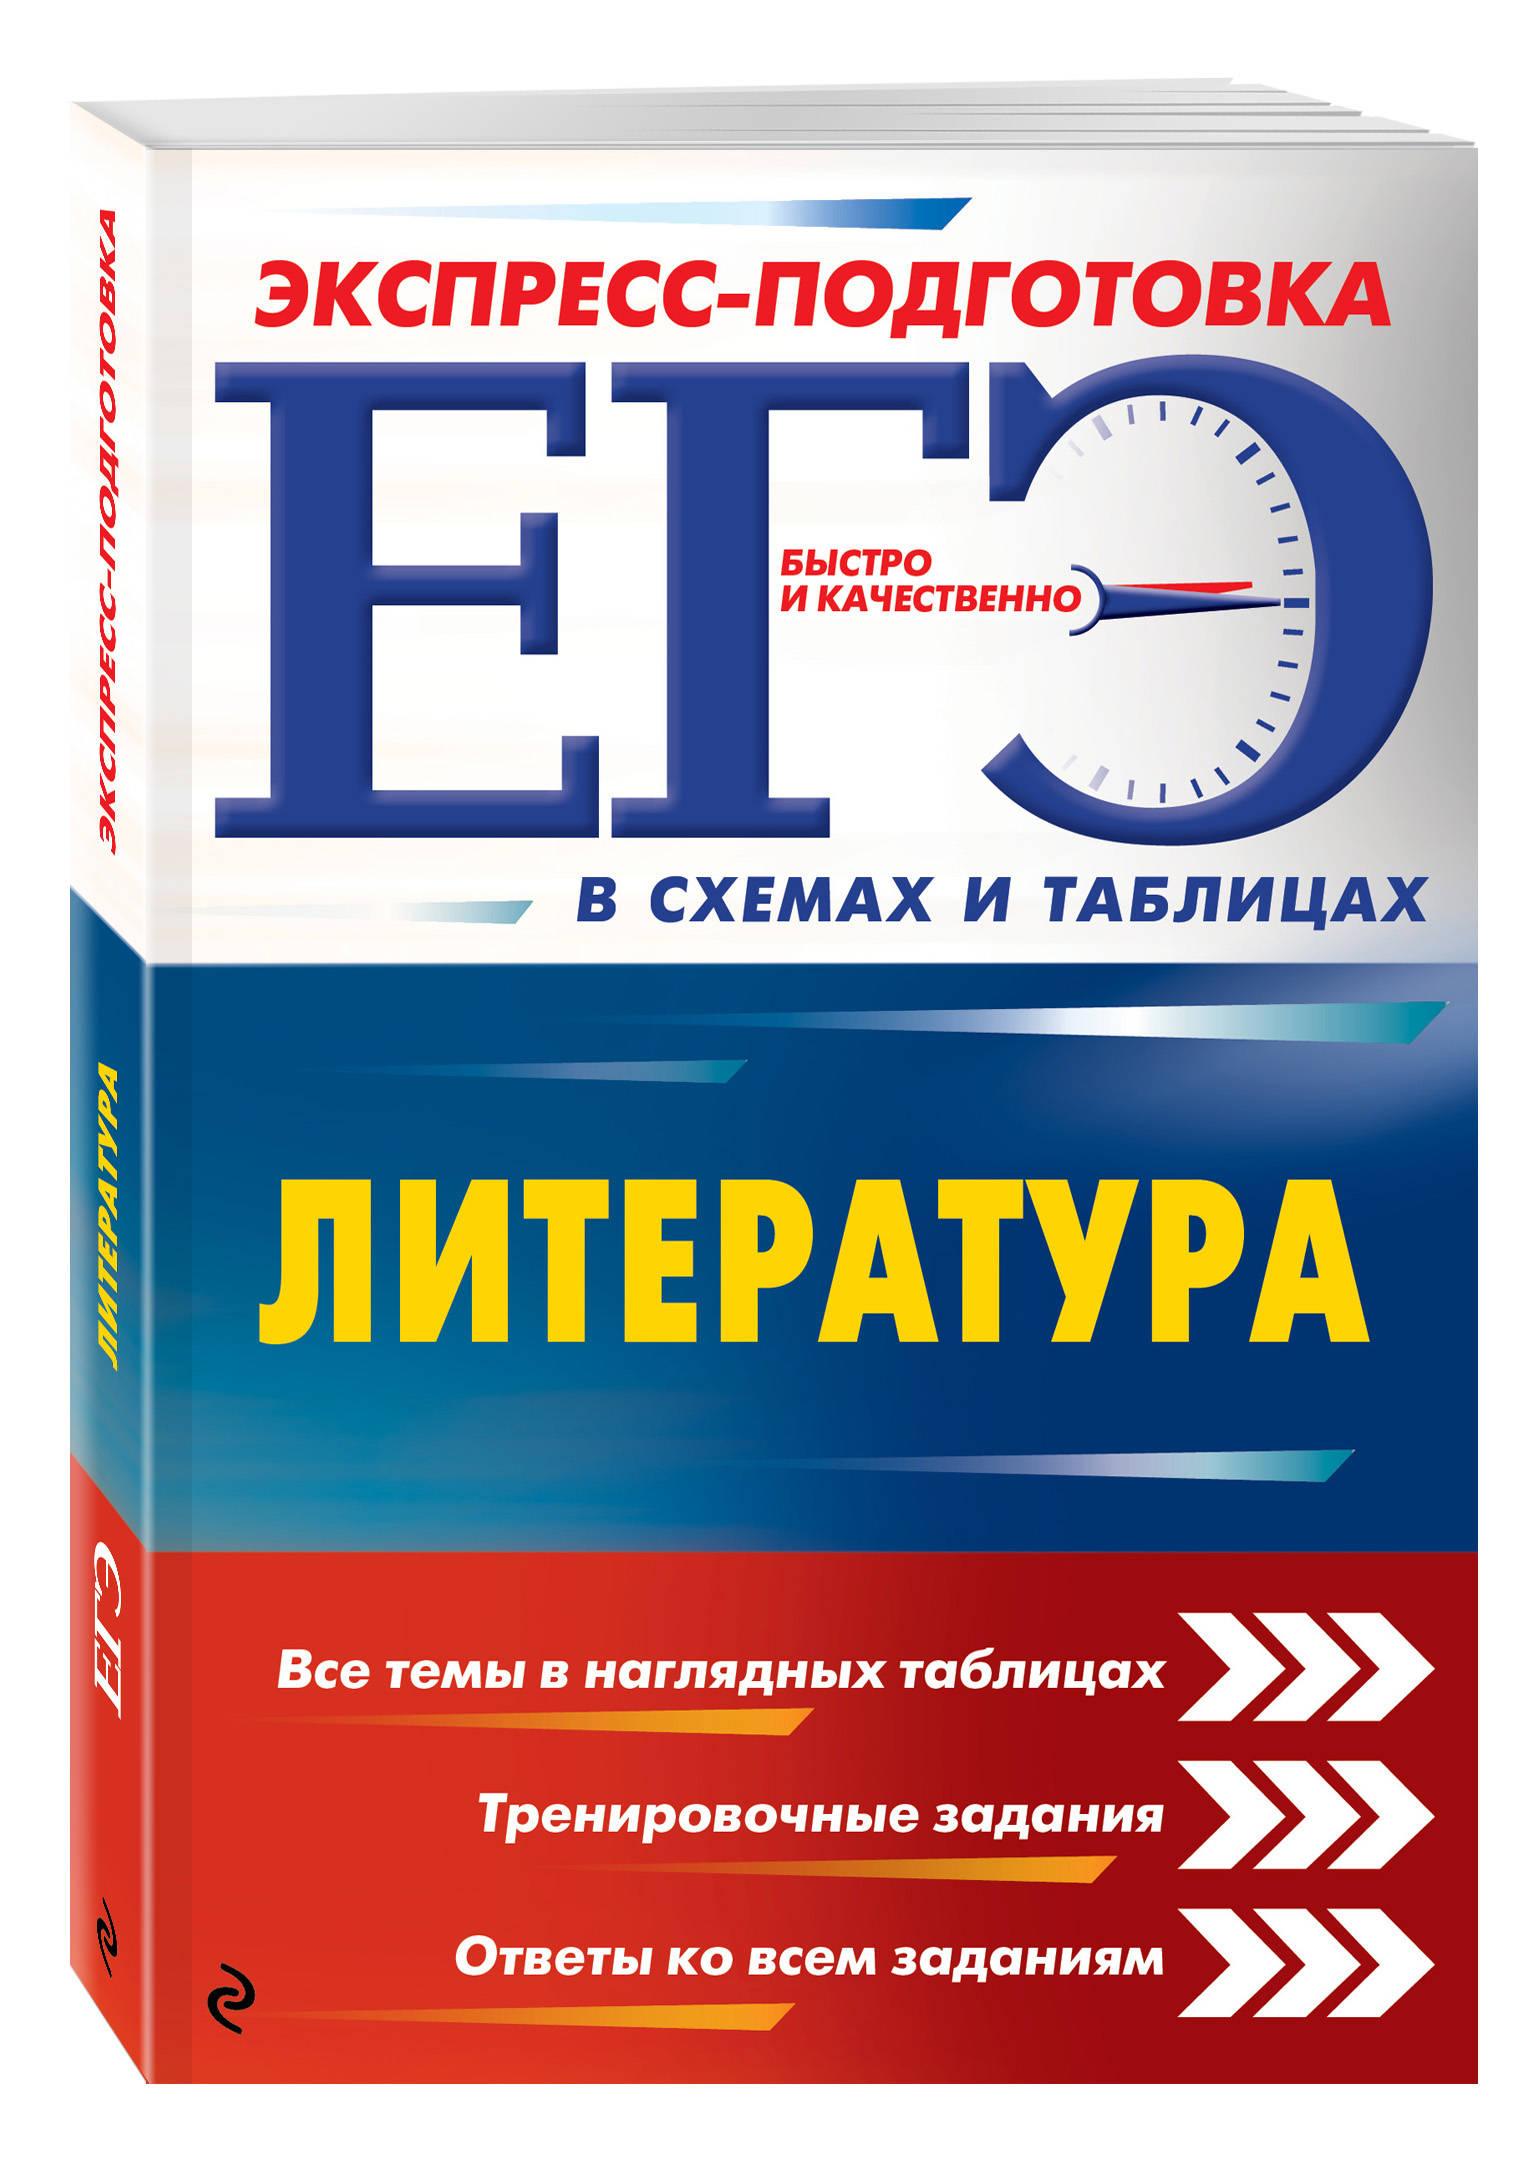 ЕГЭ. Литература ( Титаренко Е.А., Хадыко Е.Ф., Жемерова А.Г.  )